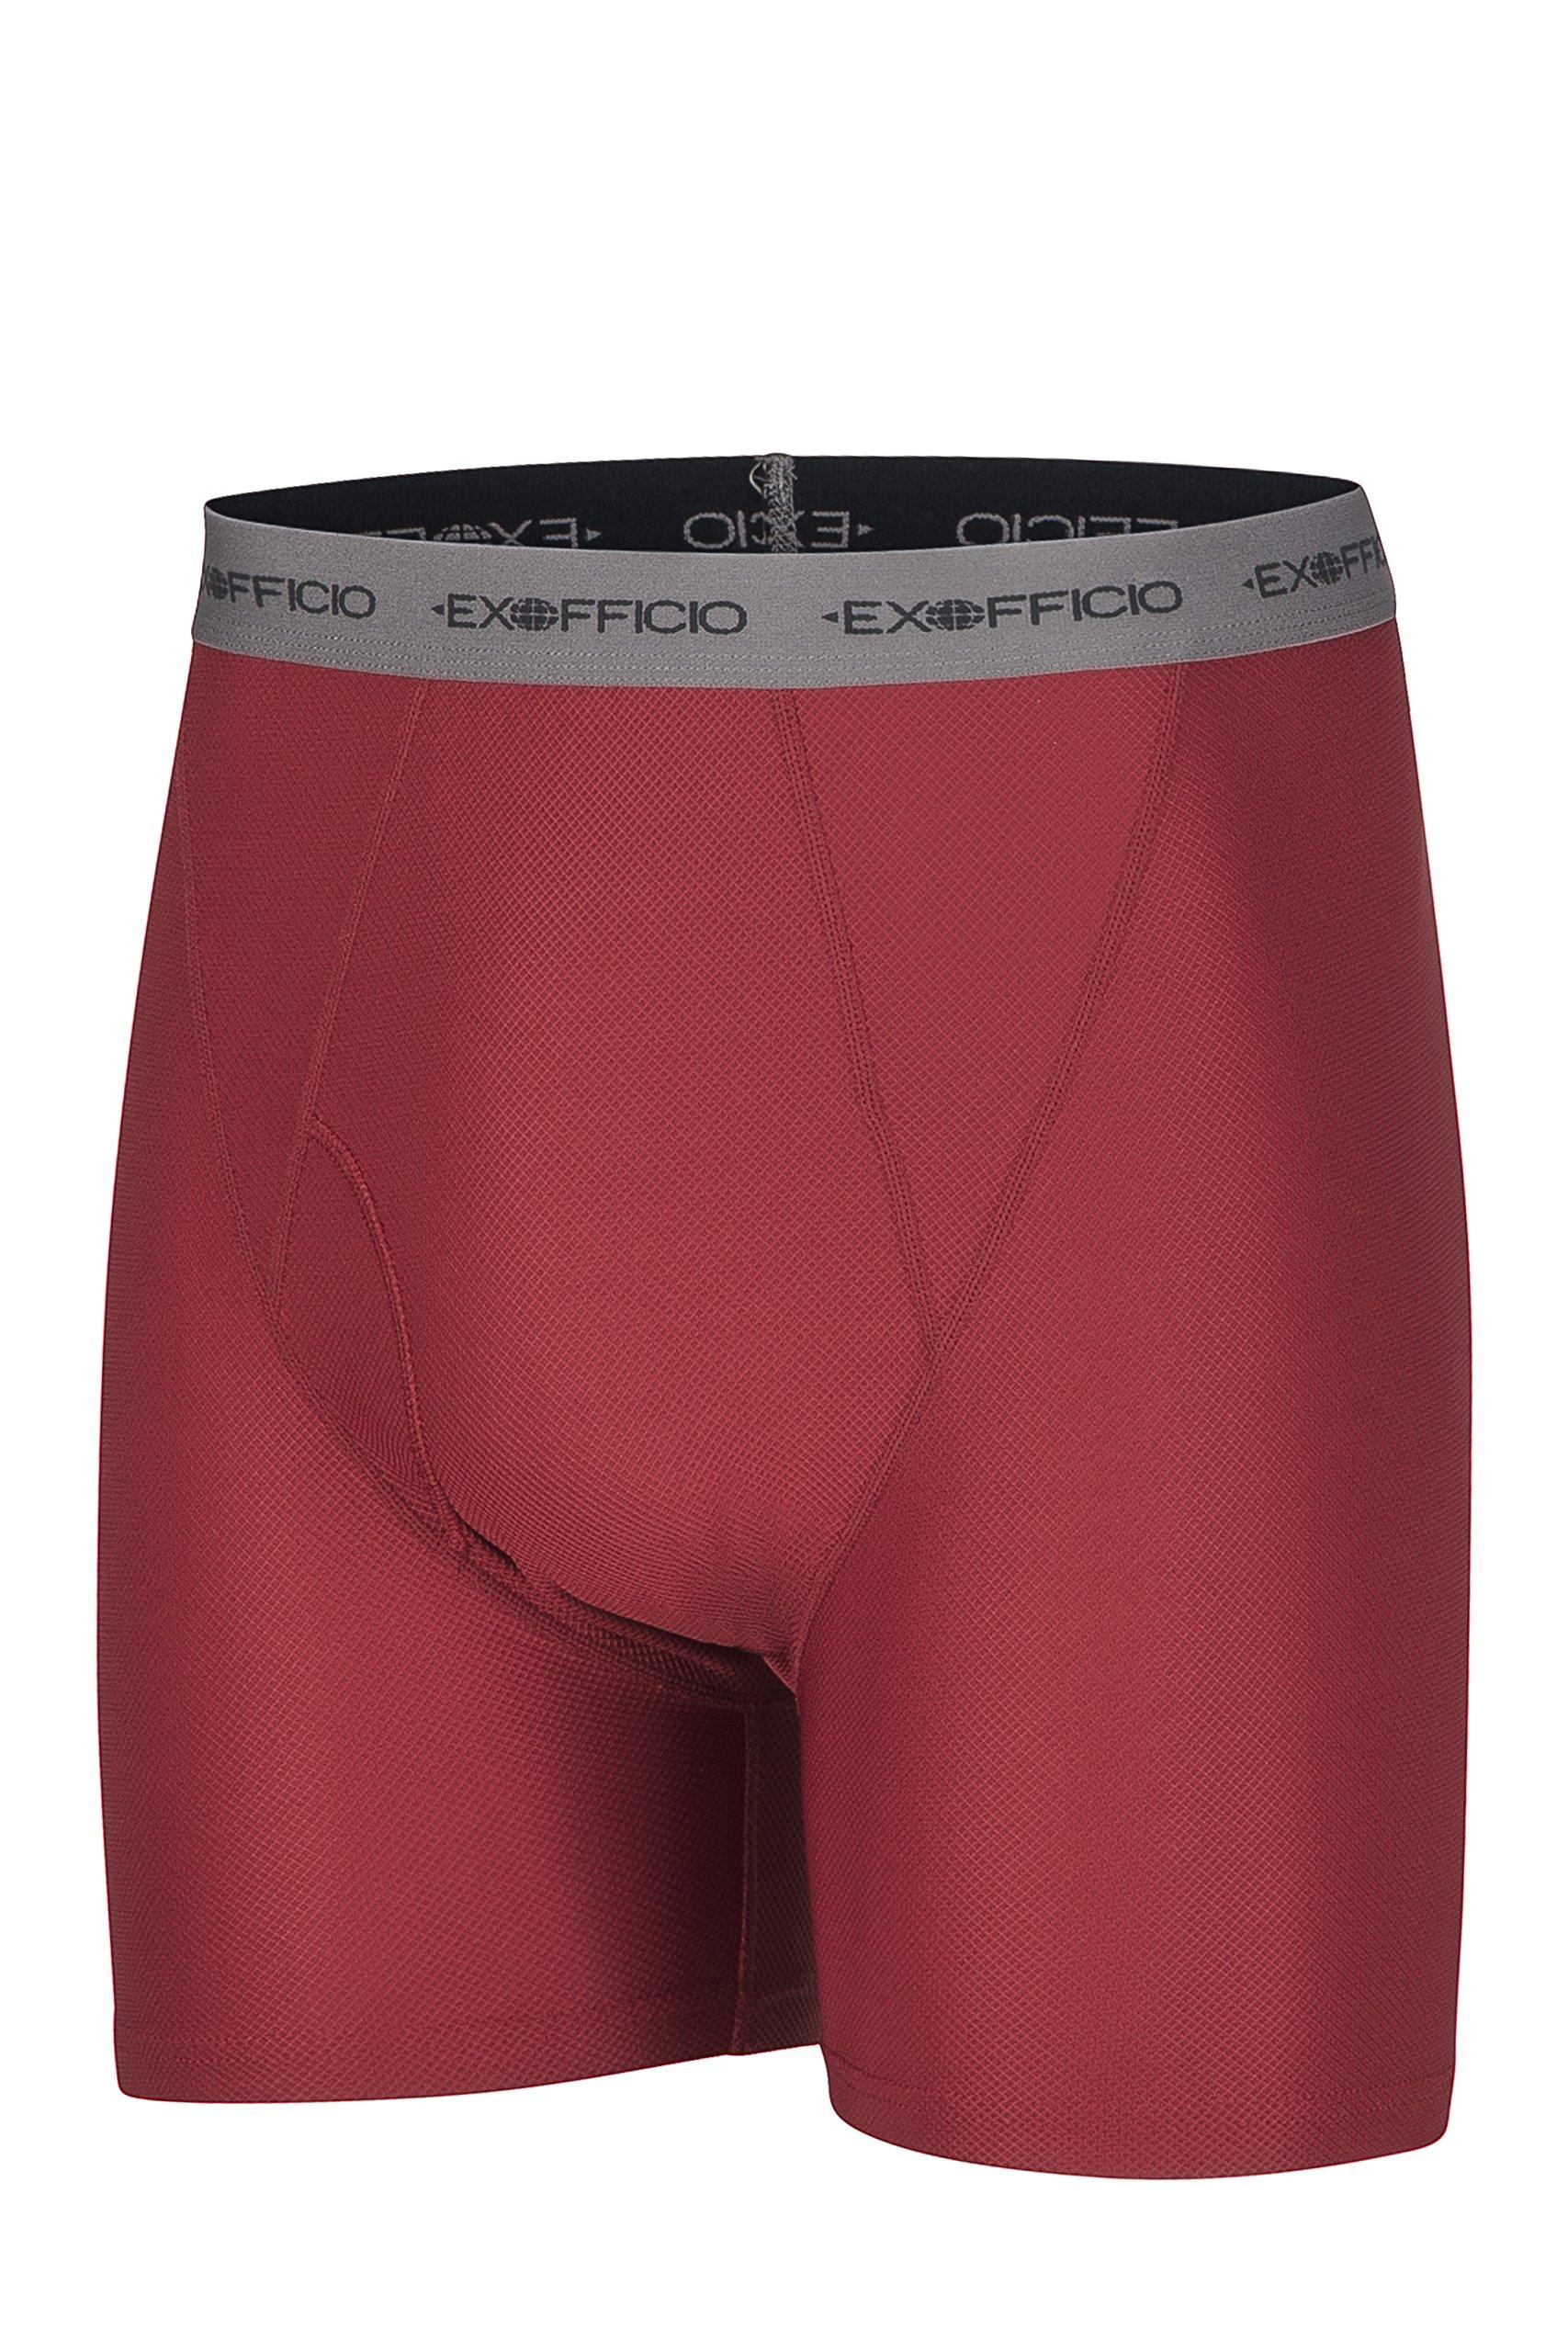 ExOfficio Men's Give-N-Go Boxer Brief,Bolero Red/Grey,Large